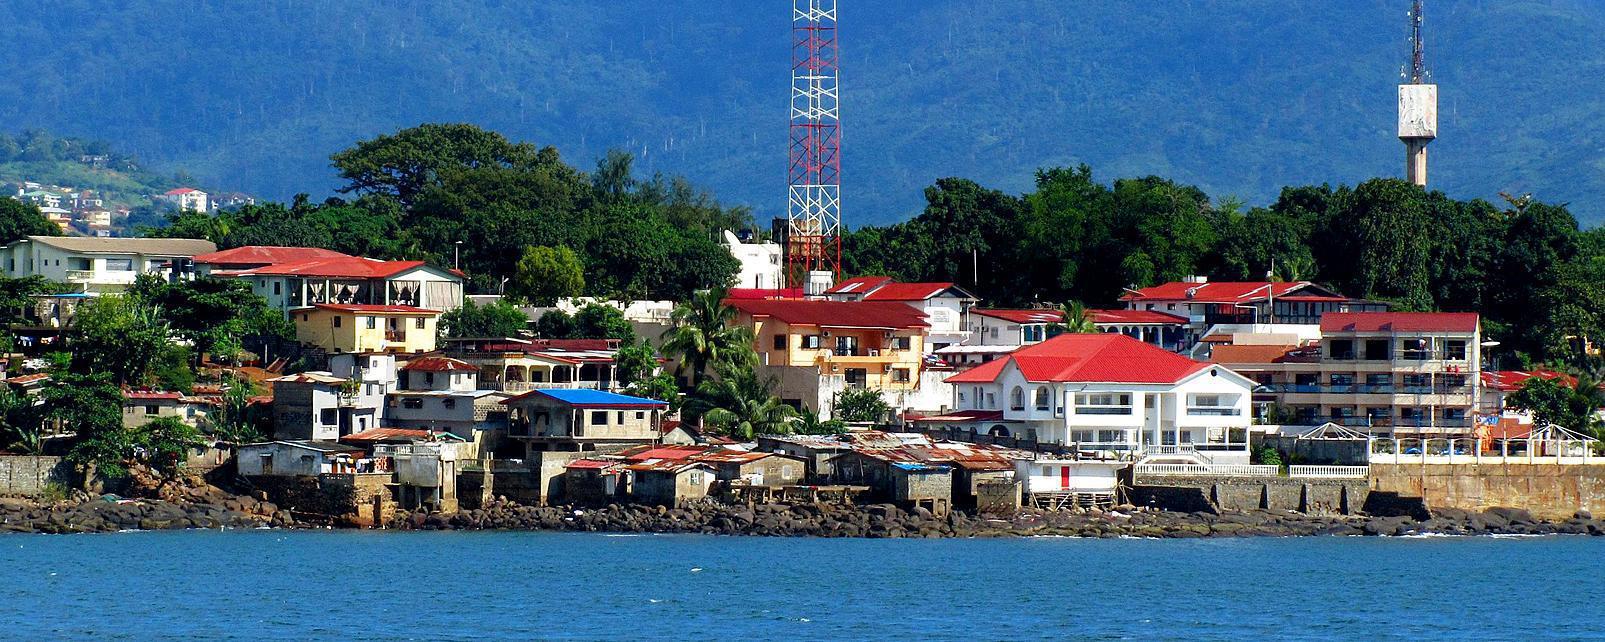 Afrique; Sierra Leone; Freetown;